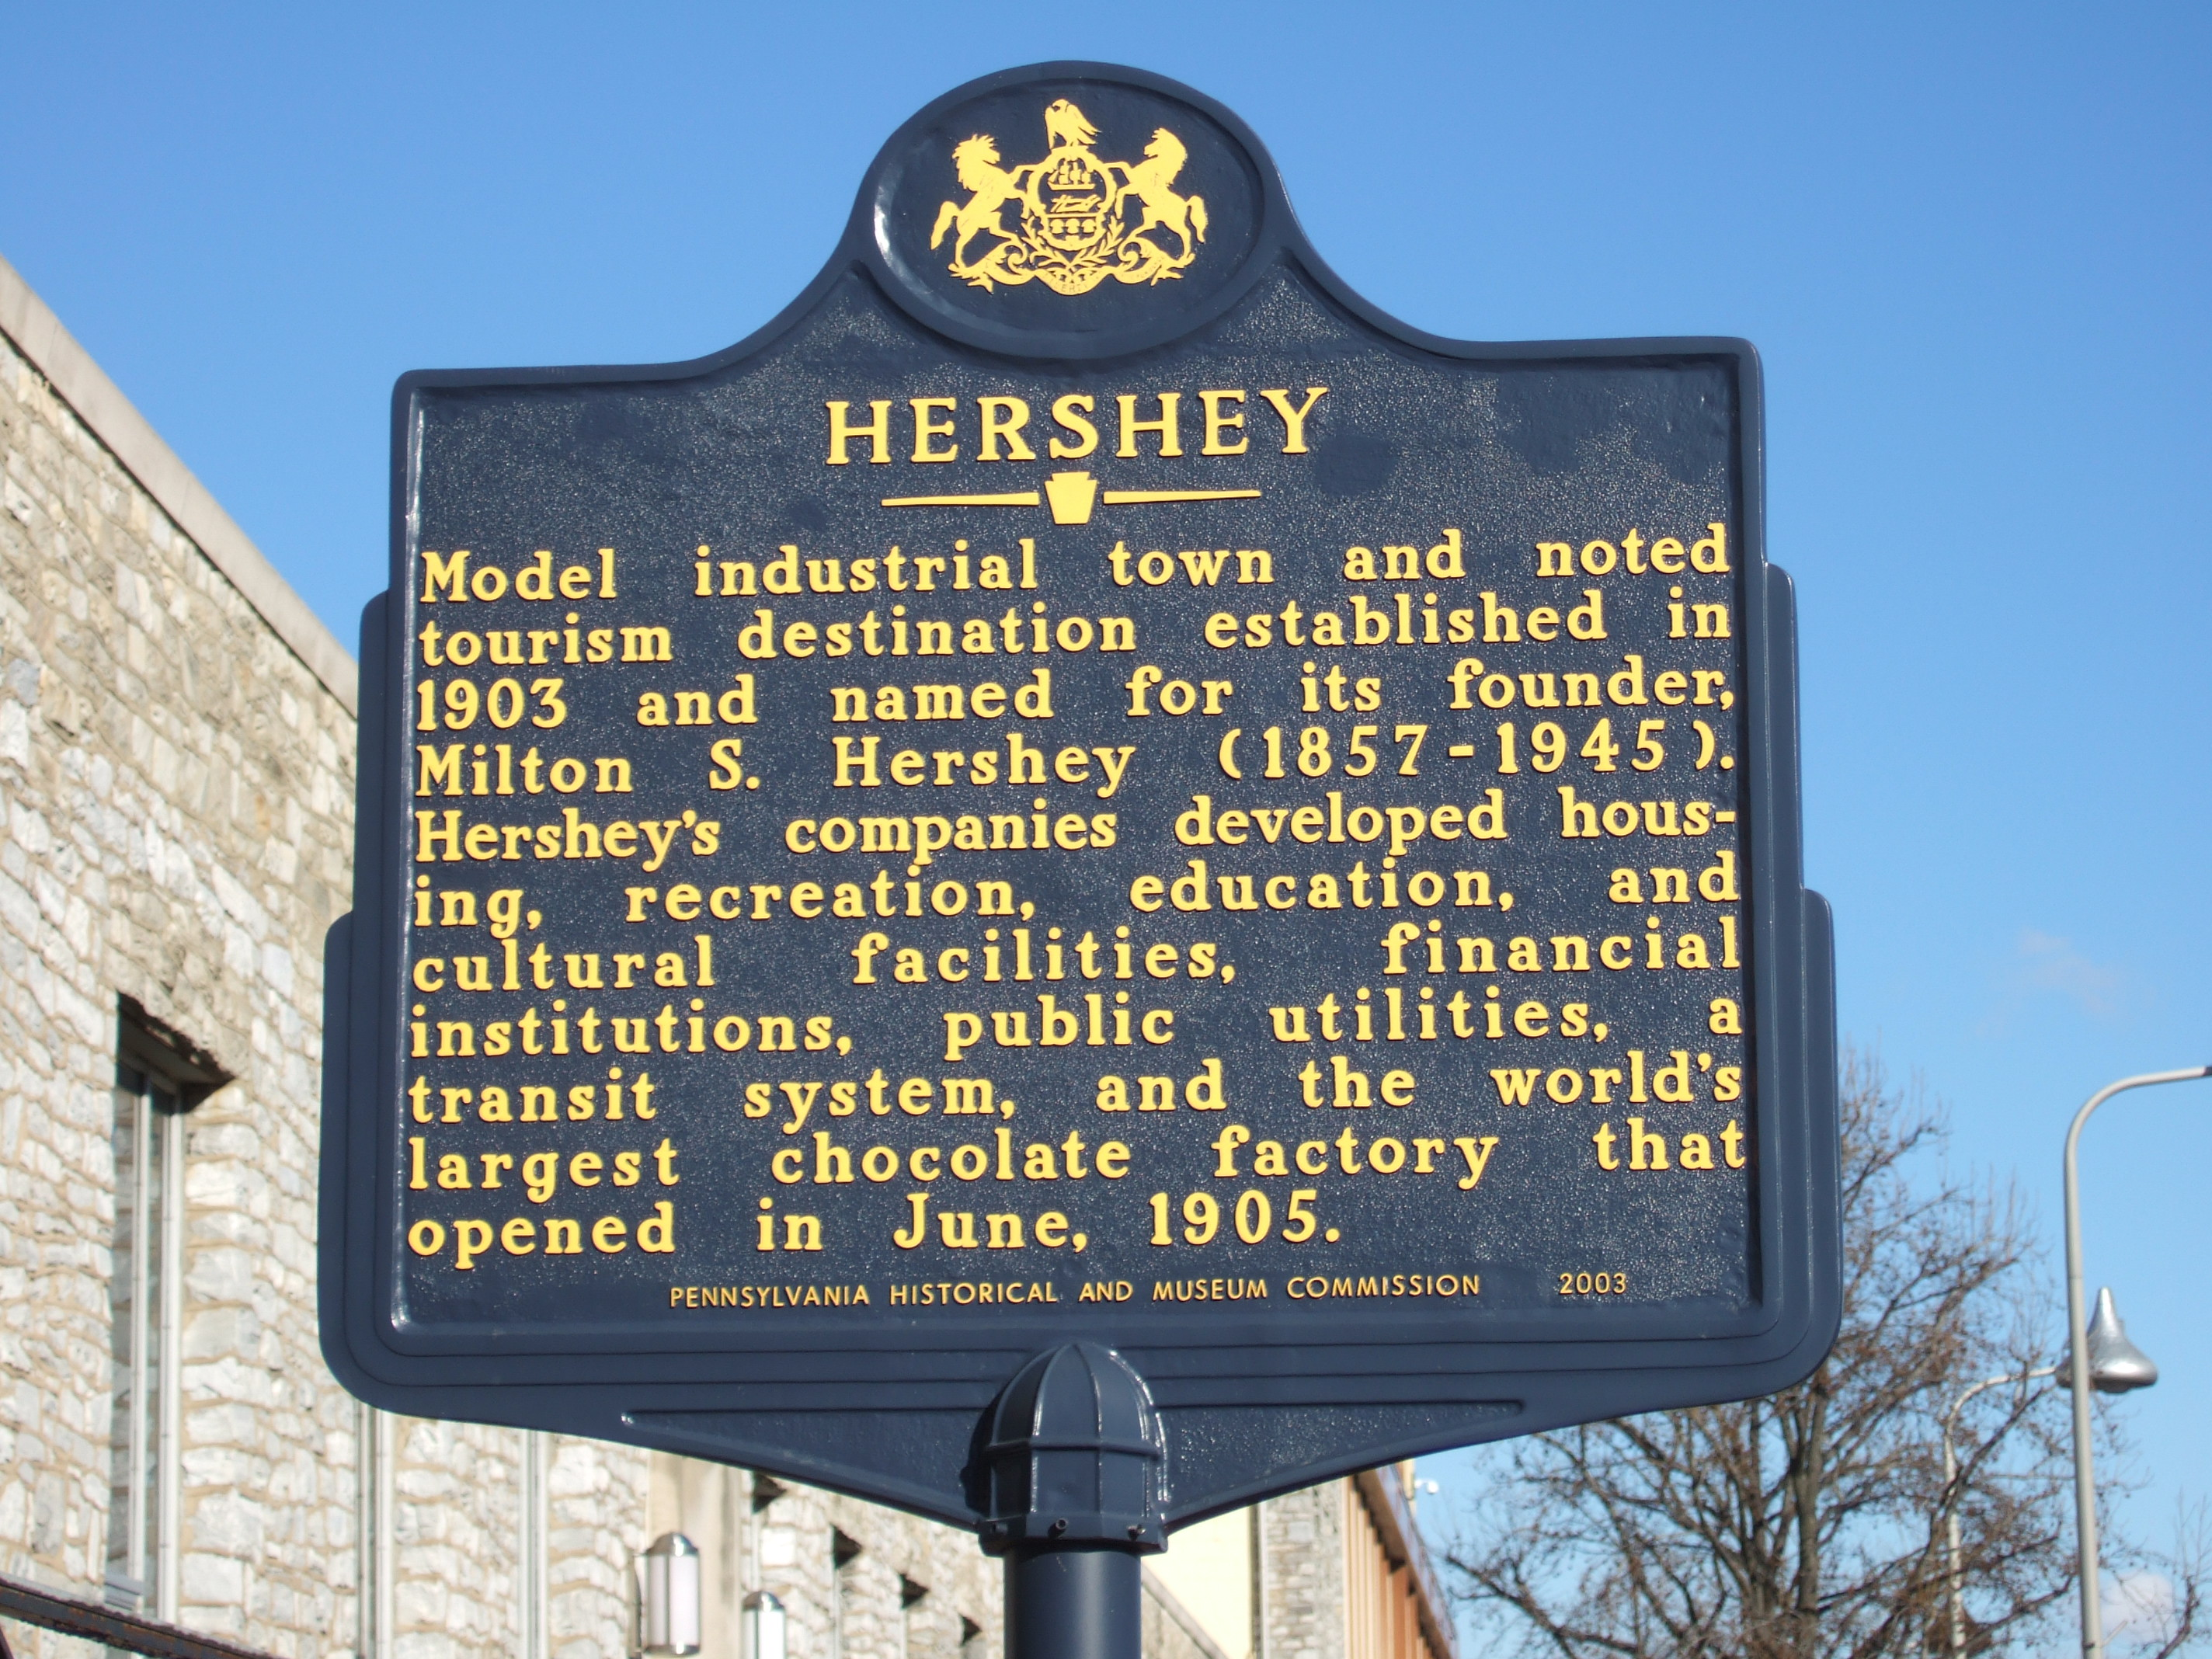 Worksheet Hershey Chocolate Company History hershey chocolate company class pasign